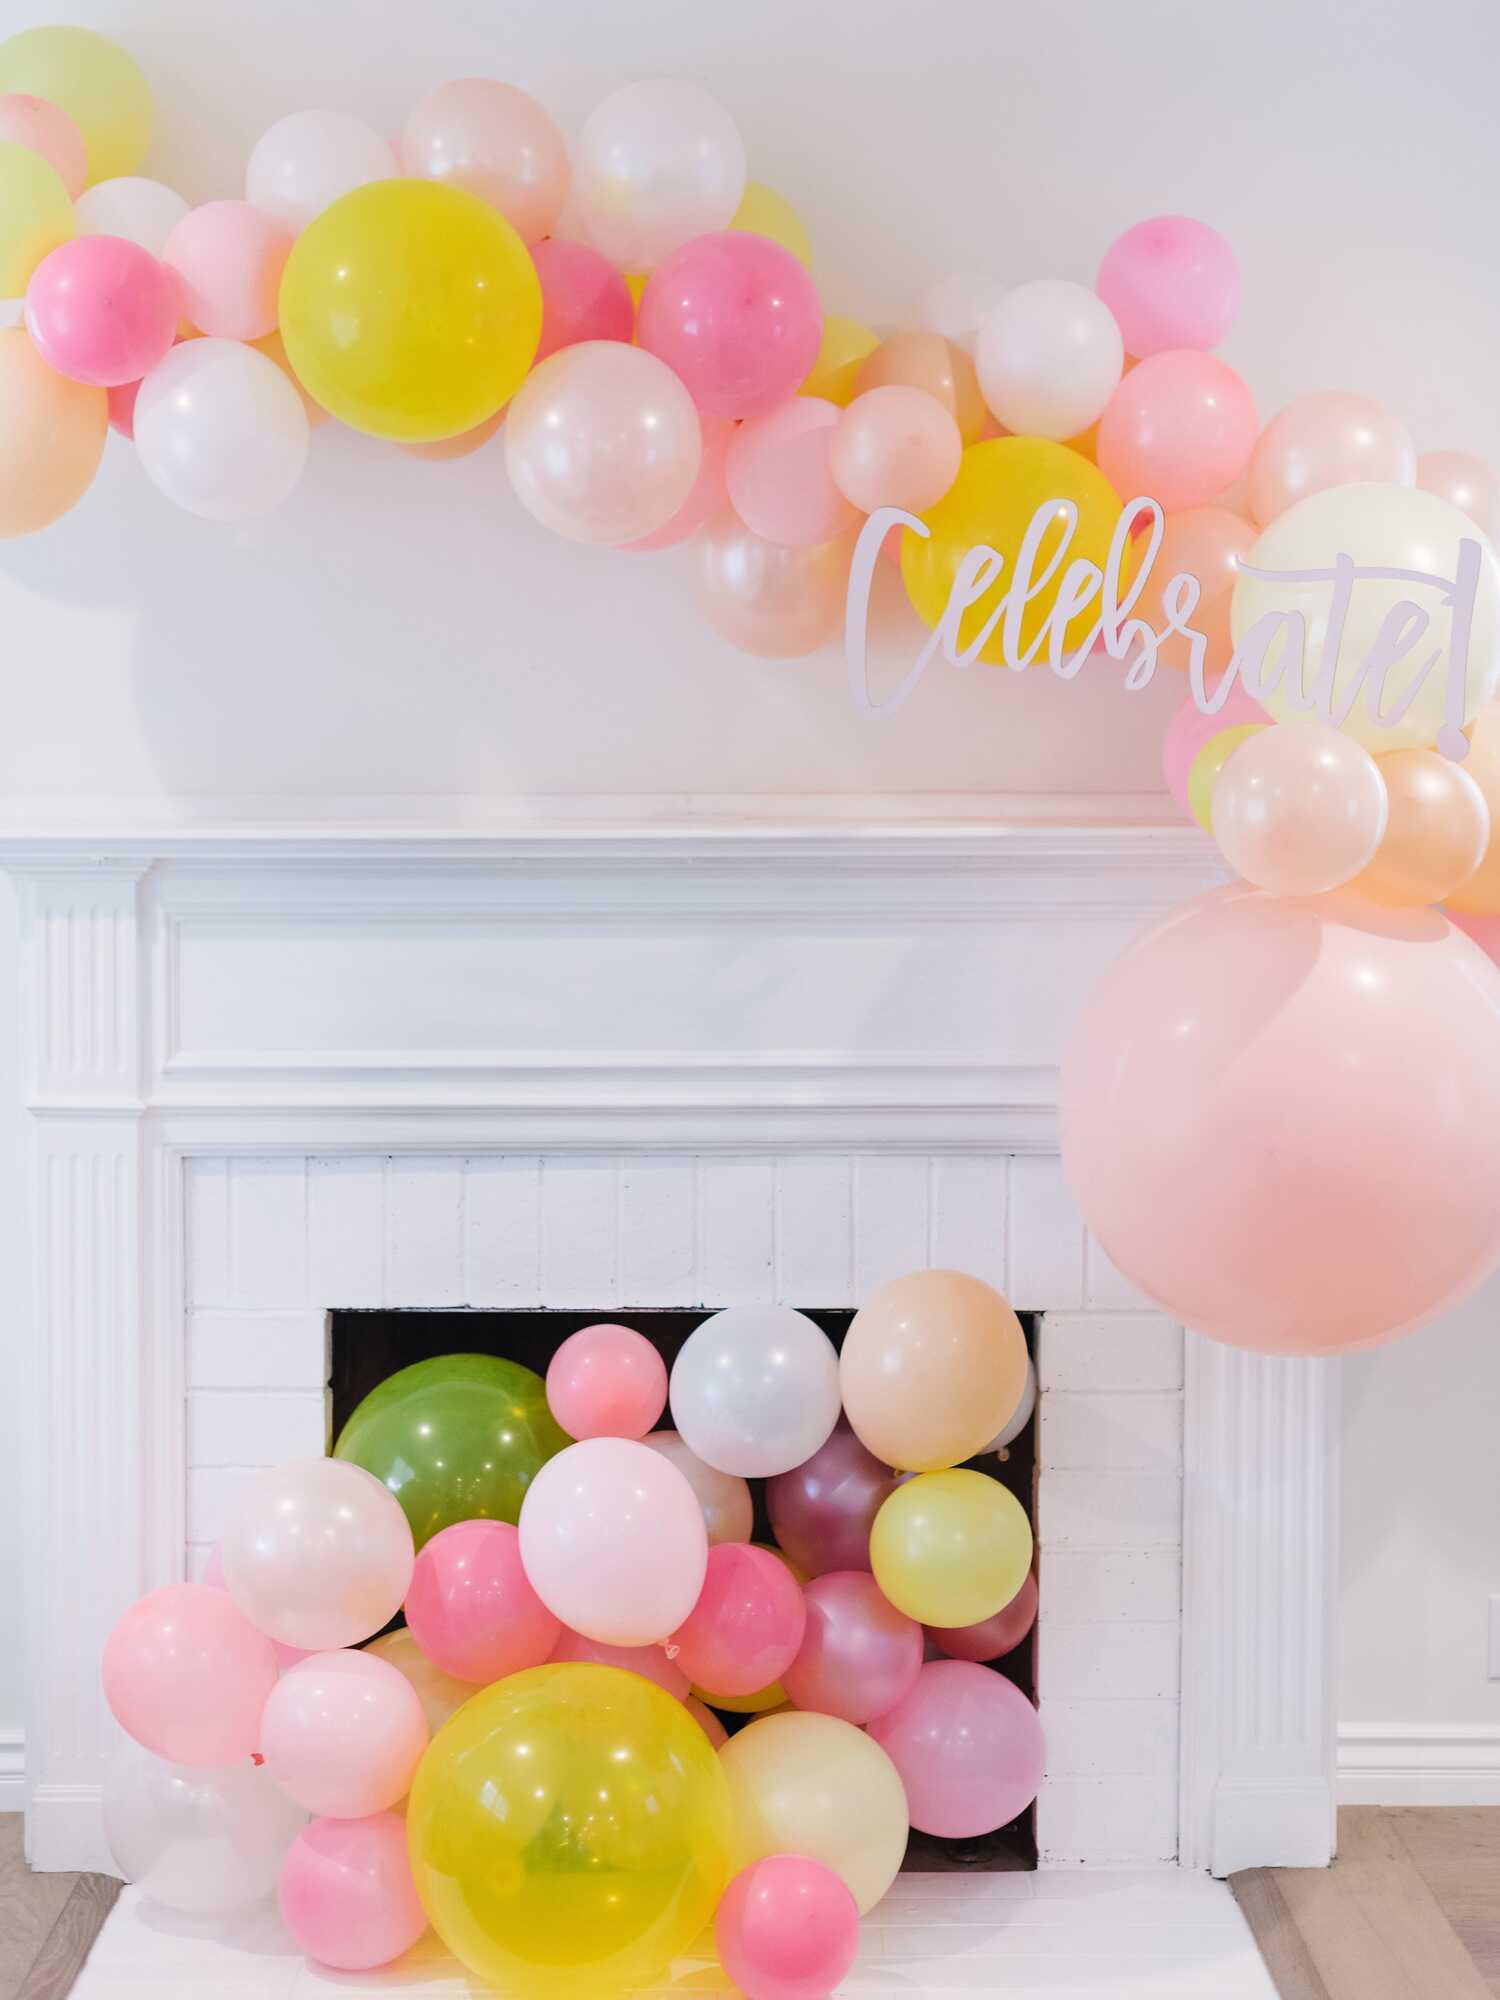 Yellow and pink balloon garland decor